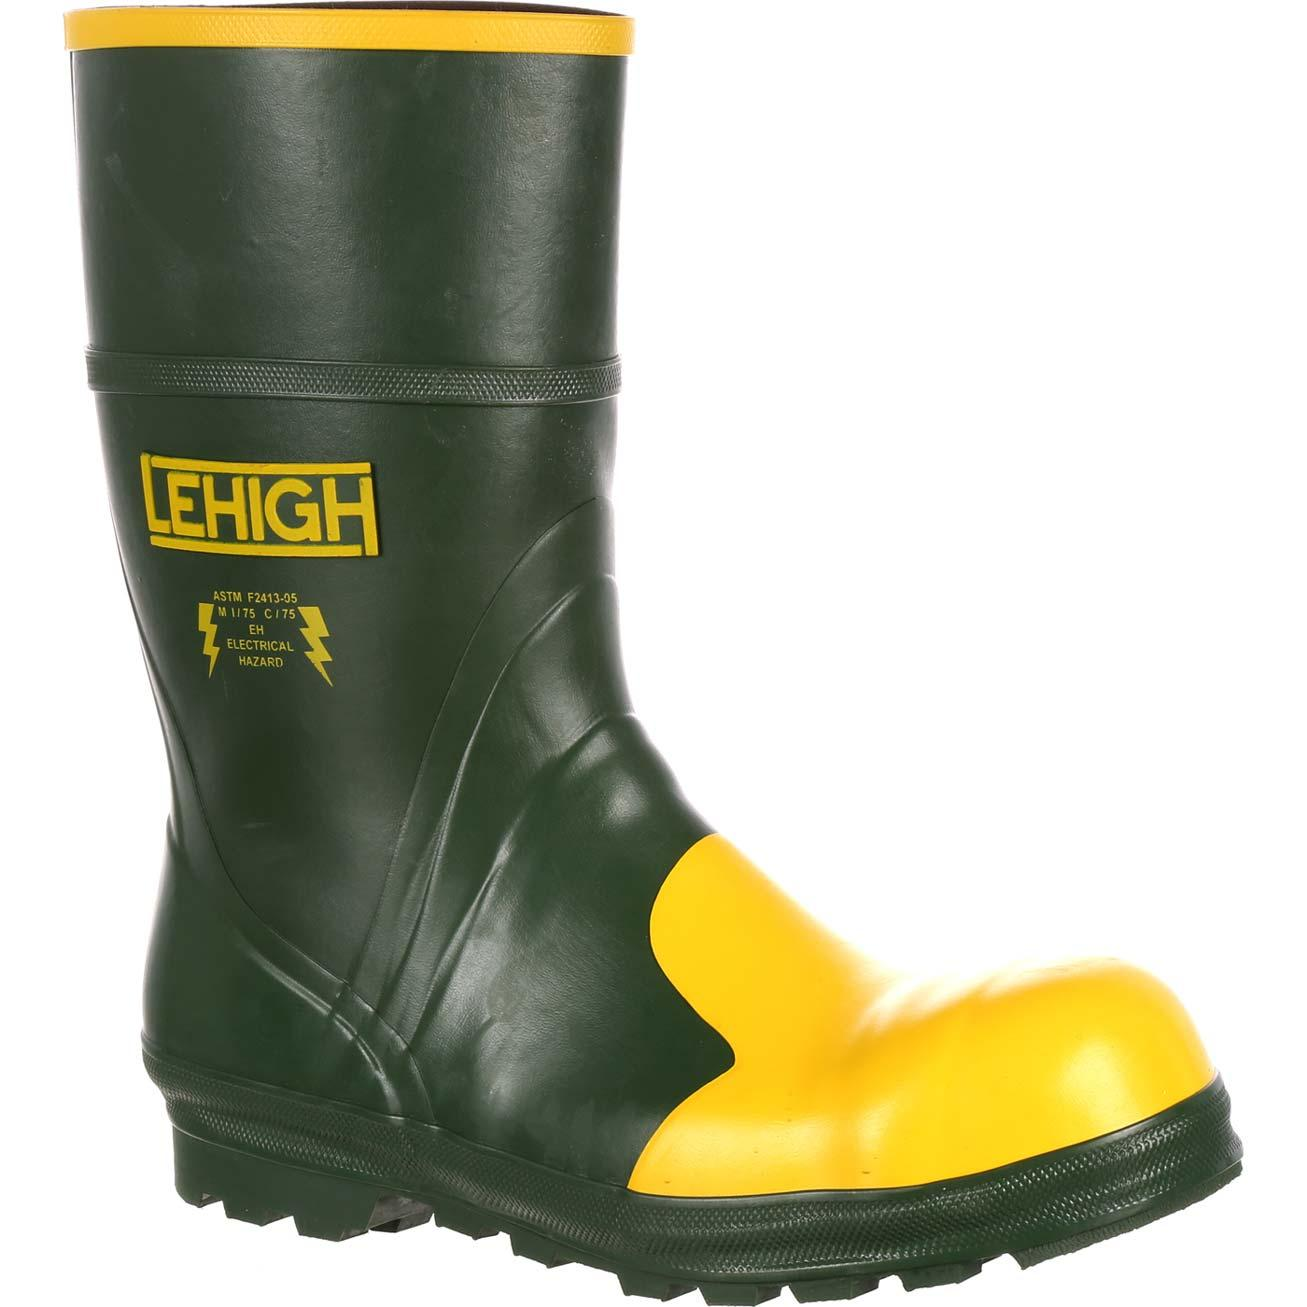 Lehigh Steel Toe Rubber Hydroshock Dielectric Waterproof